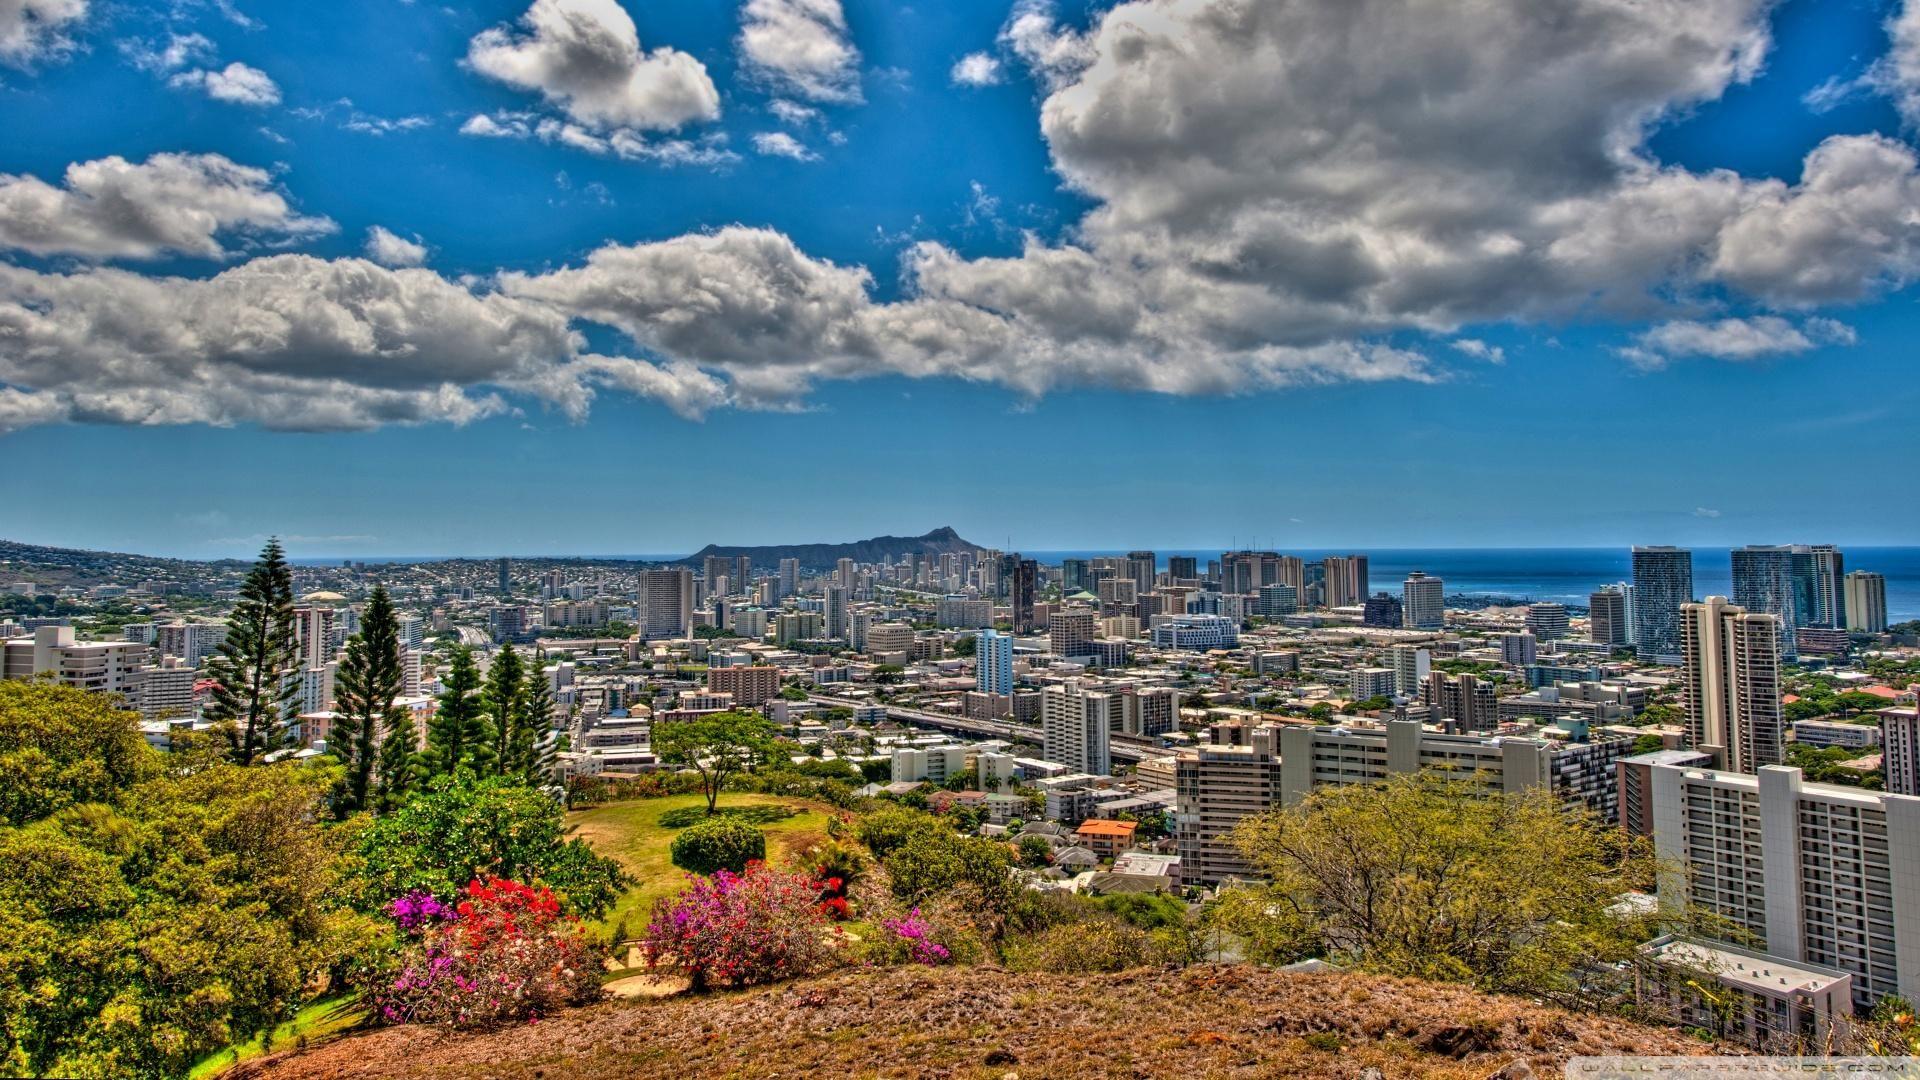 Honolulu Hawaii Wallpaper Hd Panoramic View Of Honolulu Hawaii Hdr Wallpaper Honolulu Hawaii Honolulu Panoramic Views